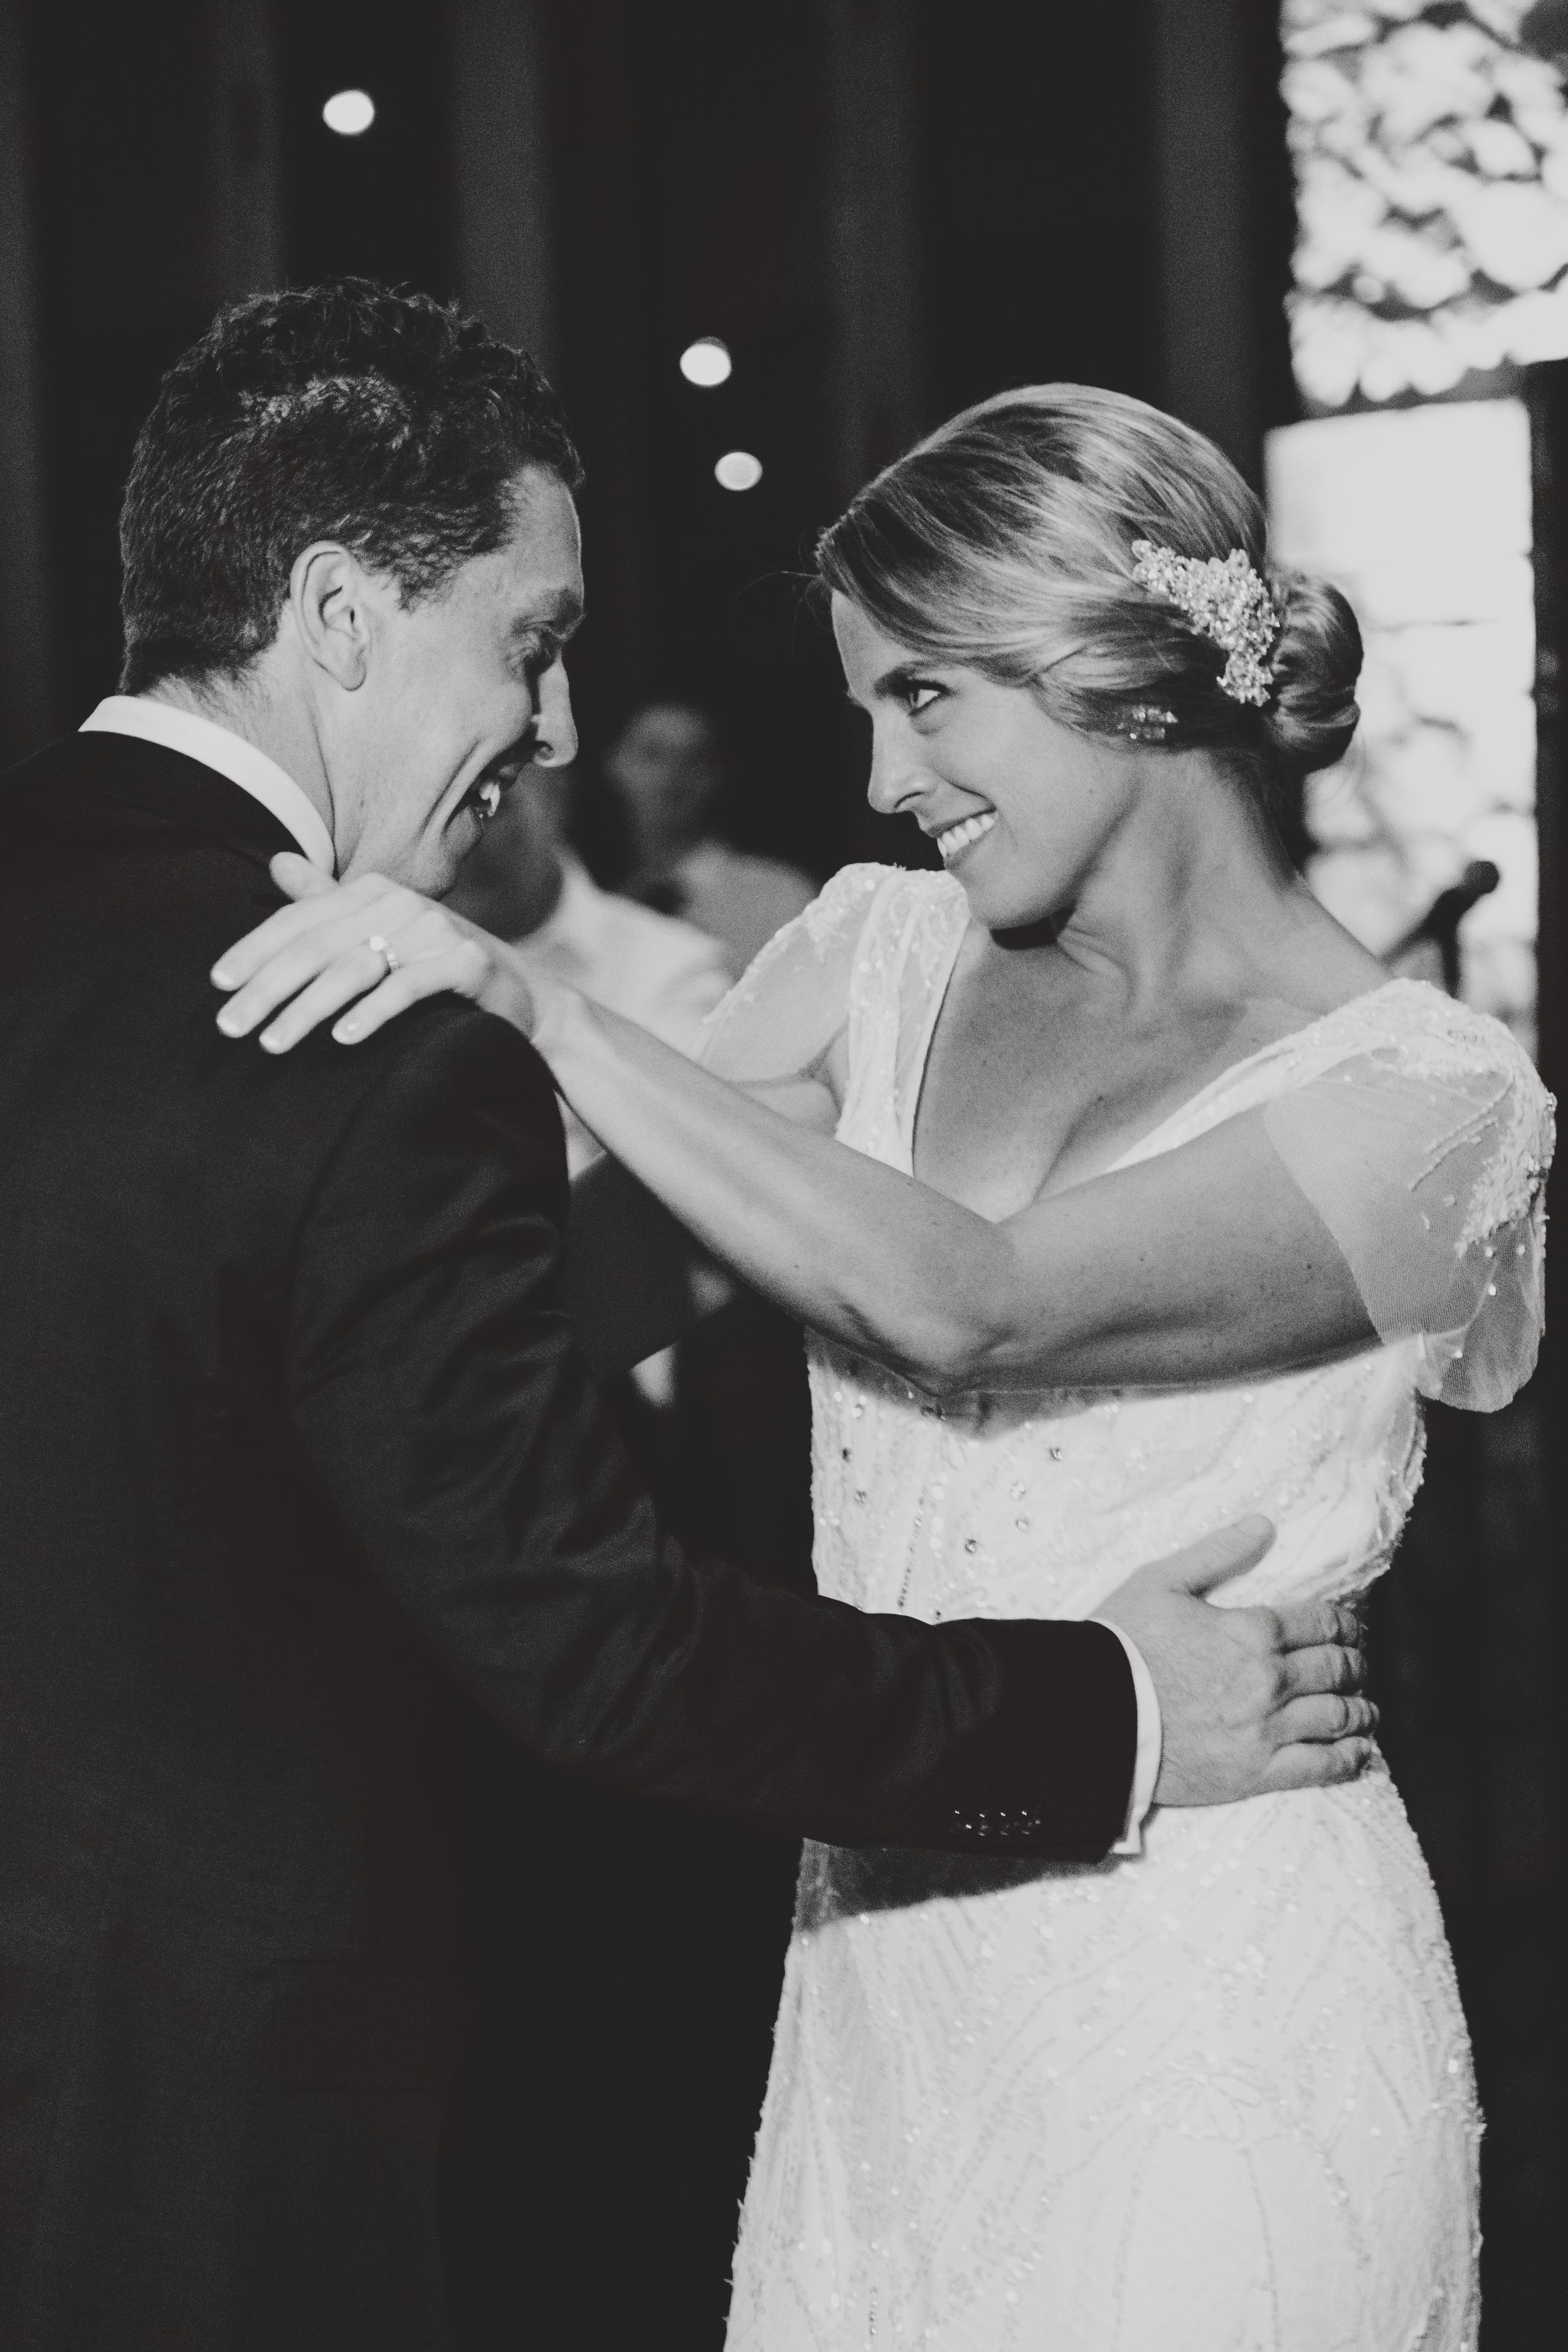 angie-diaz-photography-maui-wedding-mel-matt-111.jpg